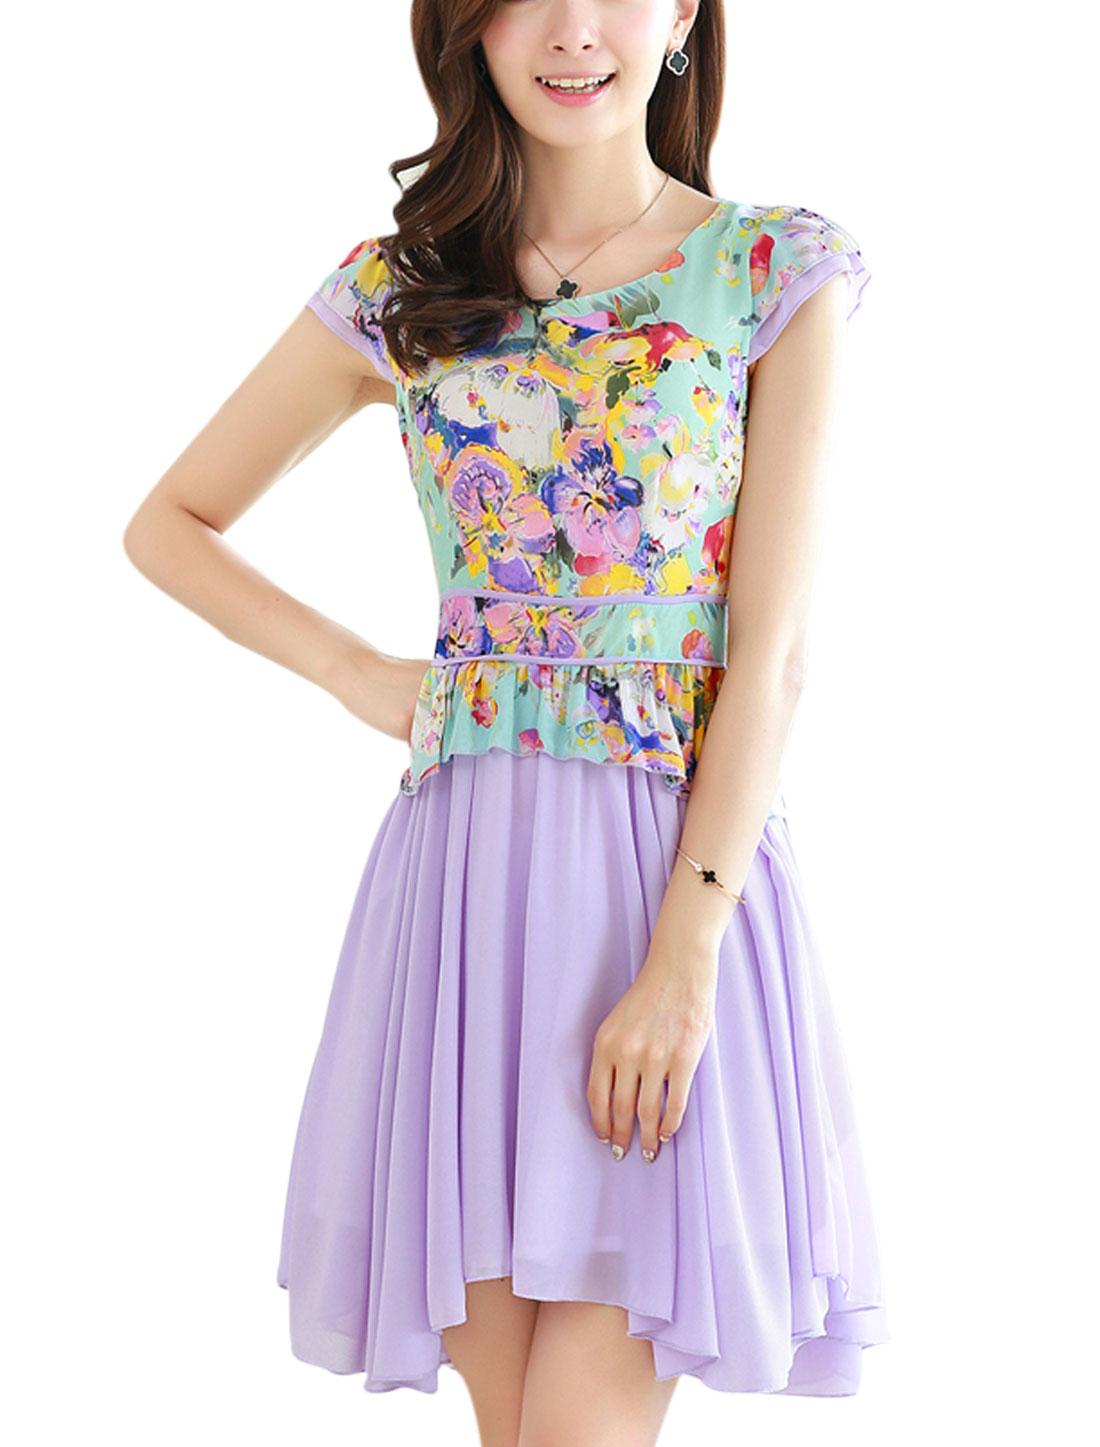 Lady Layered Cap Sleeve Floral Prints Chiffon Dress Light Purple S